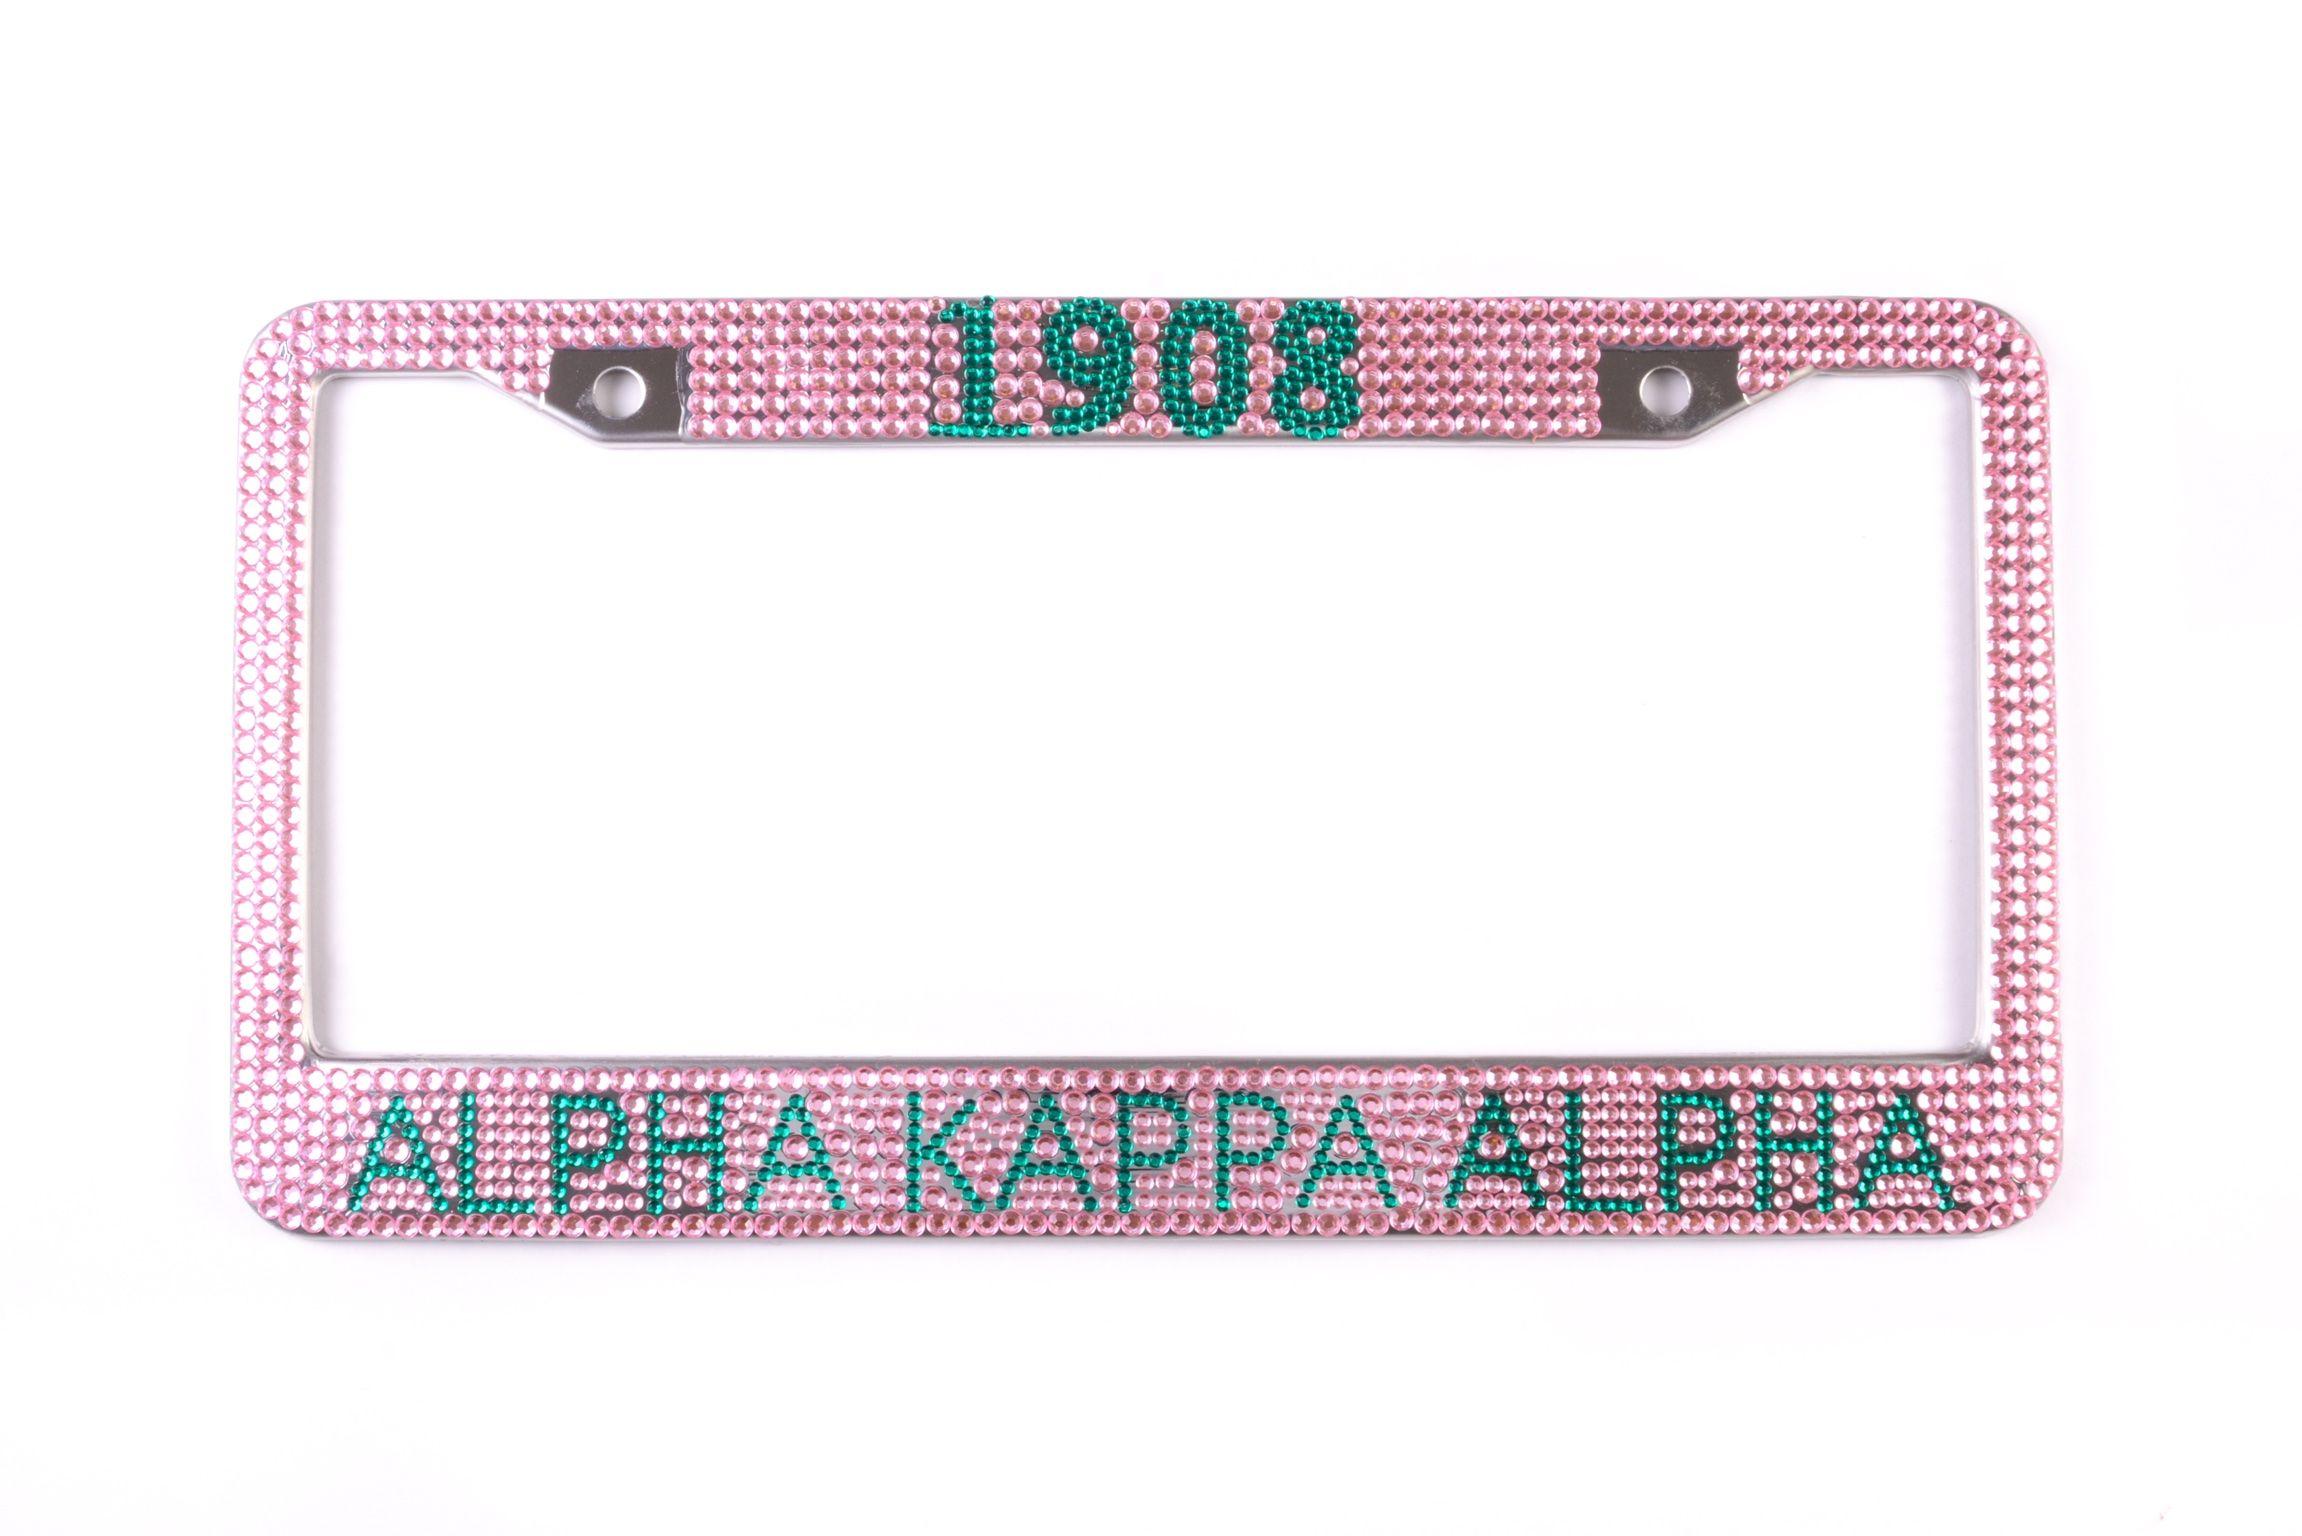 dd89a3ba6009 AKA Bling Crystal License Plate Frame | Alpha Kappa Alpha Sorority ...